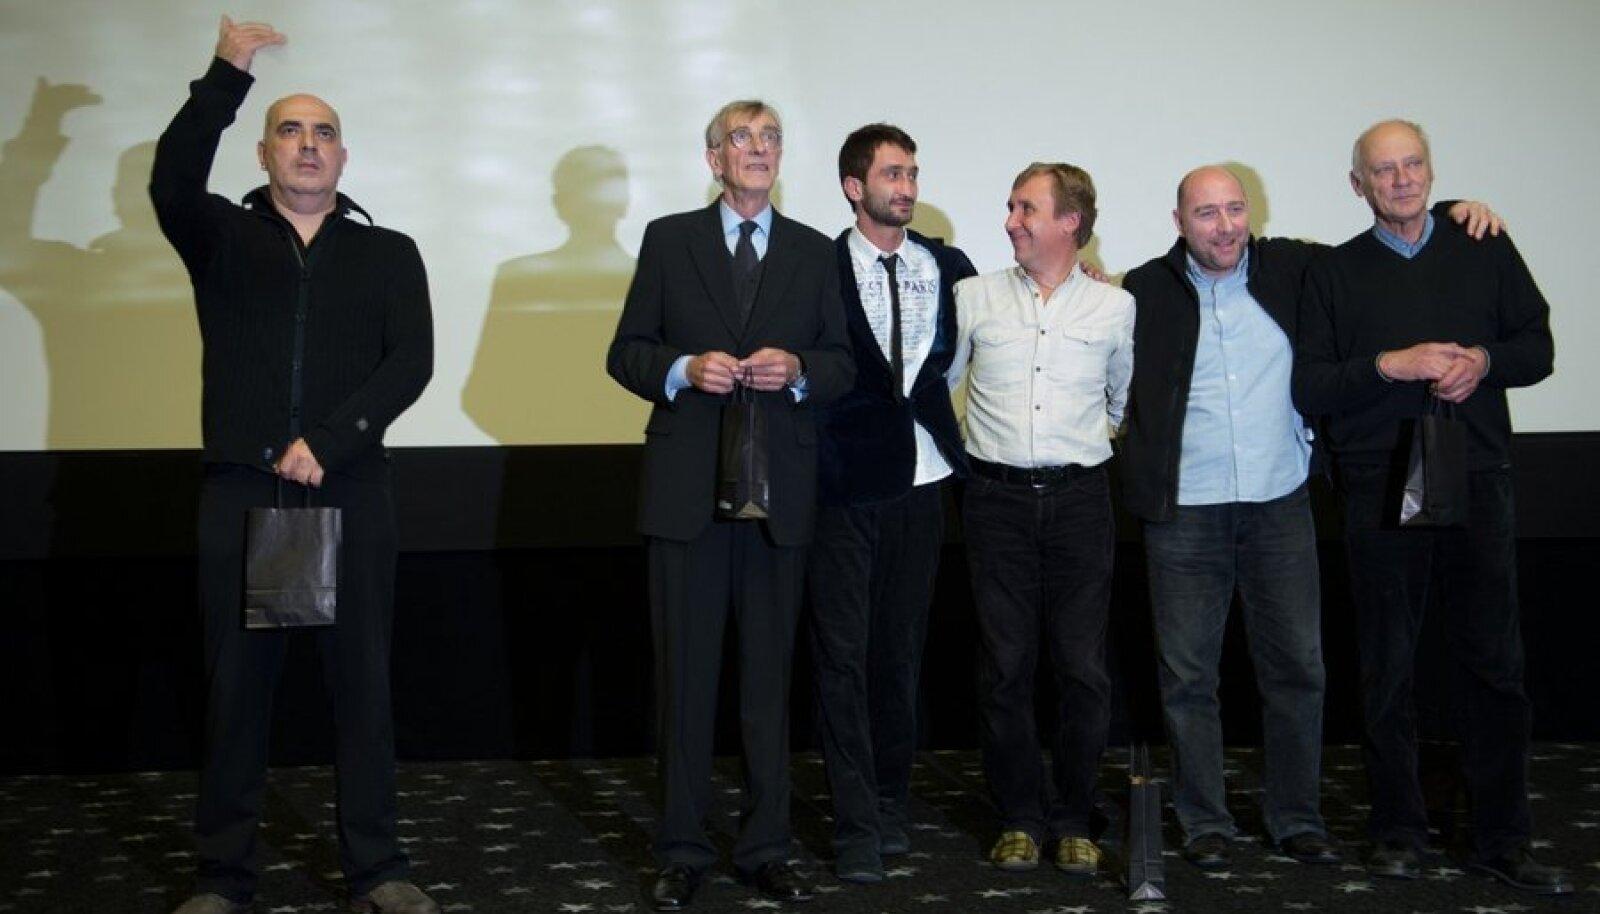 Filmi-Mandariinid-esilinastus, Lembit Ulfsak,Zaza Urushadze, Ivo Felt, Giorgi Nakashidze, Mikhail Meskhi, Elmo Nüganen, Raivo Trass